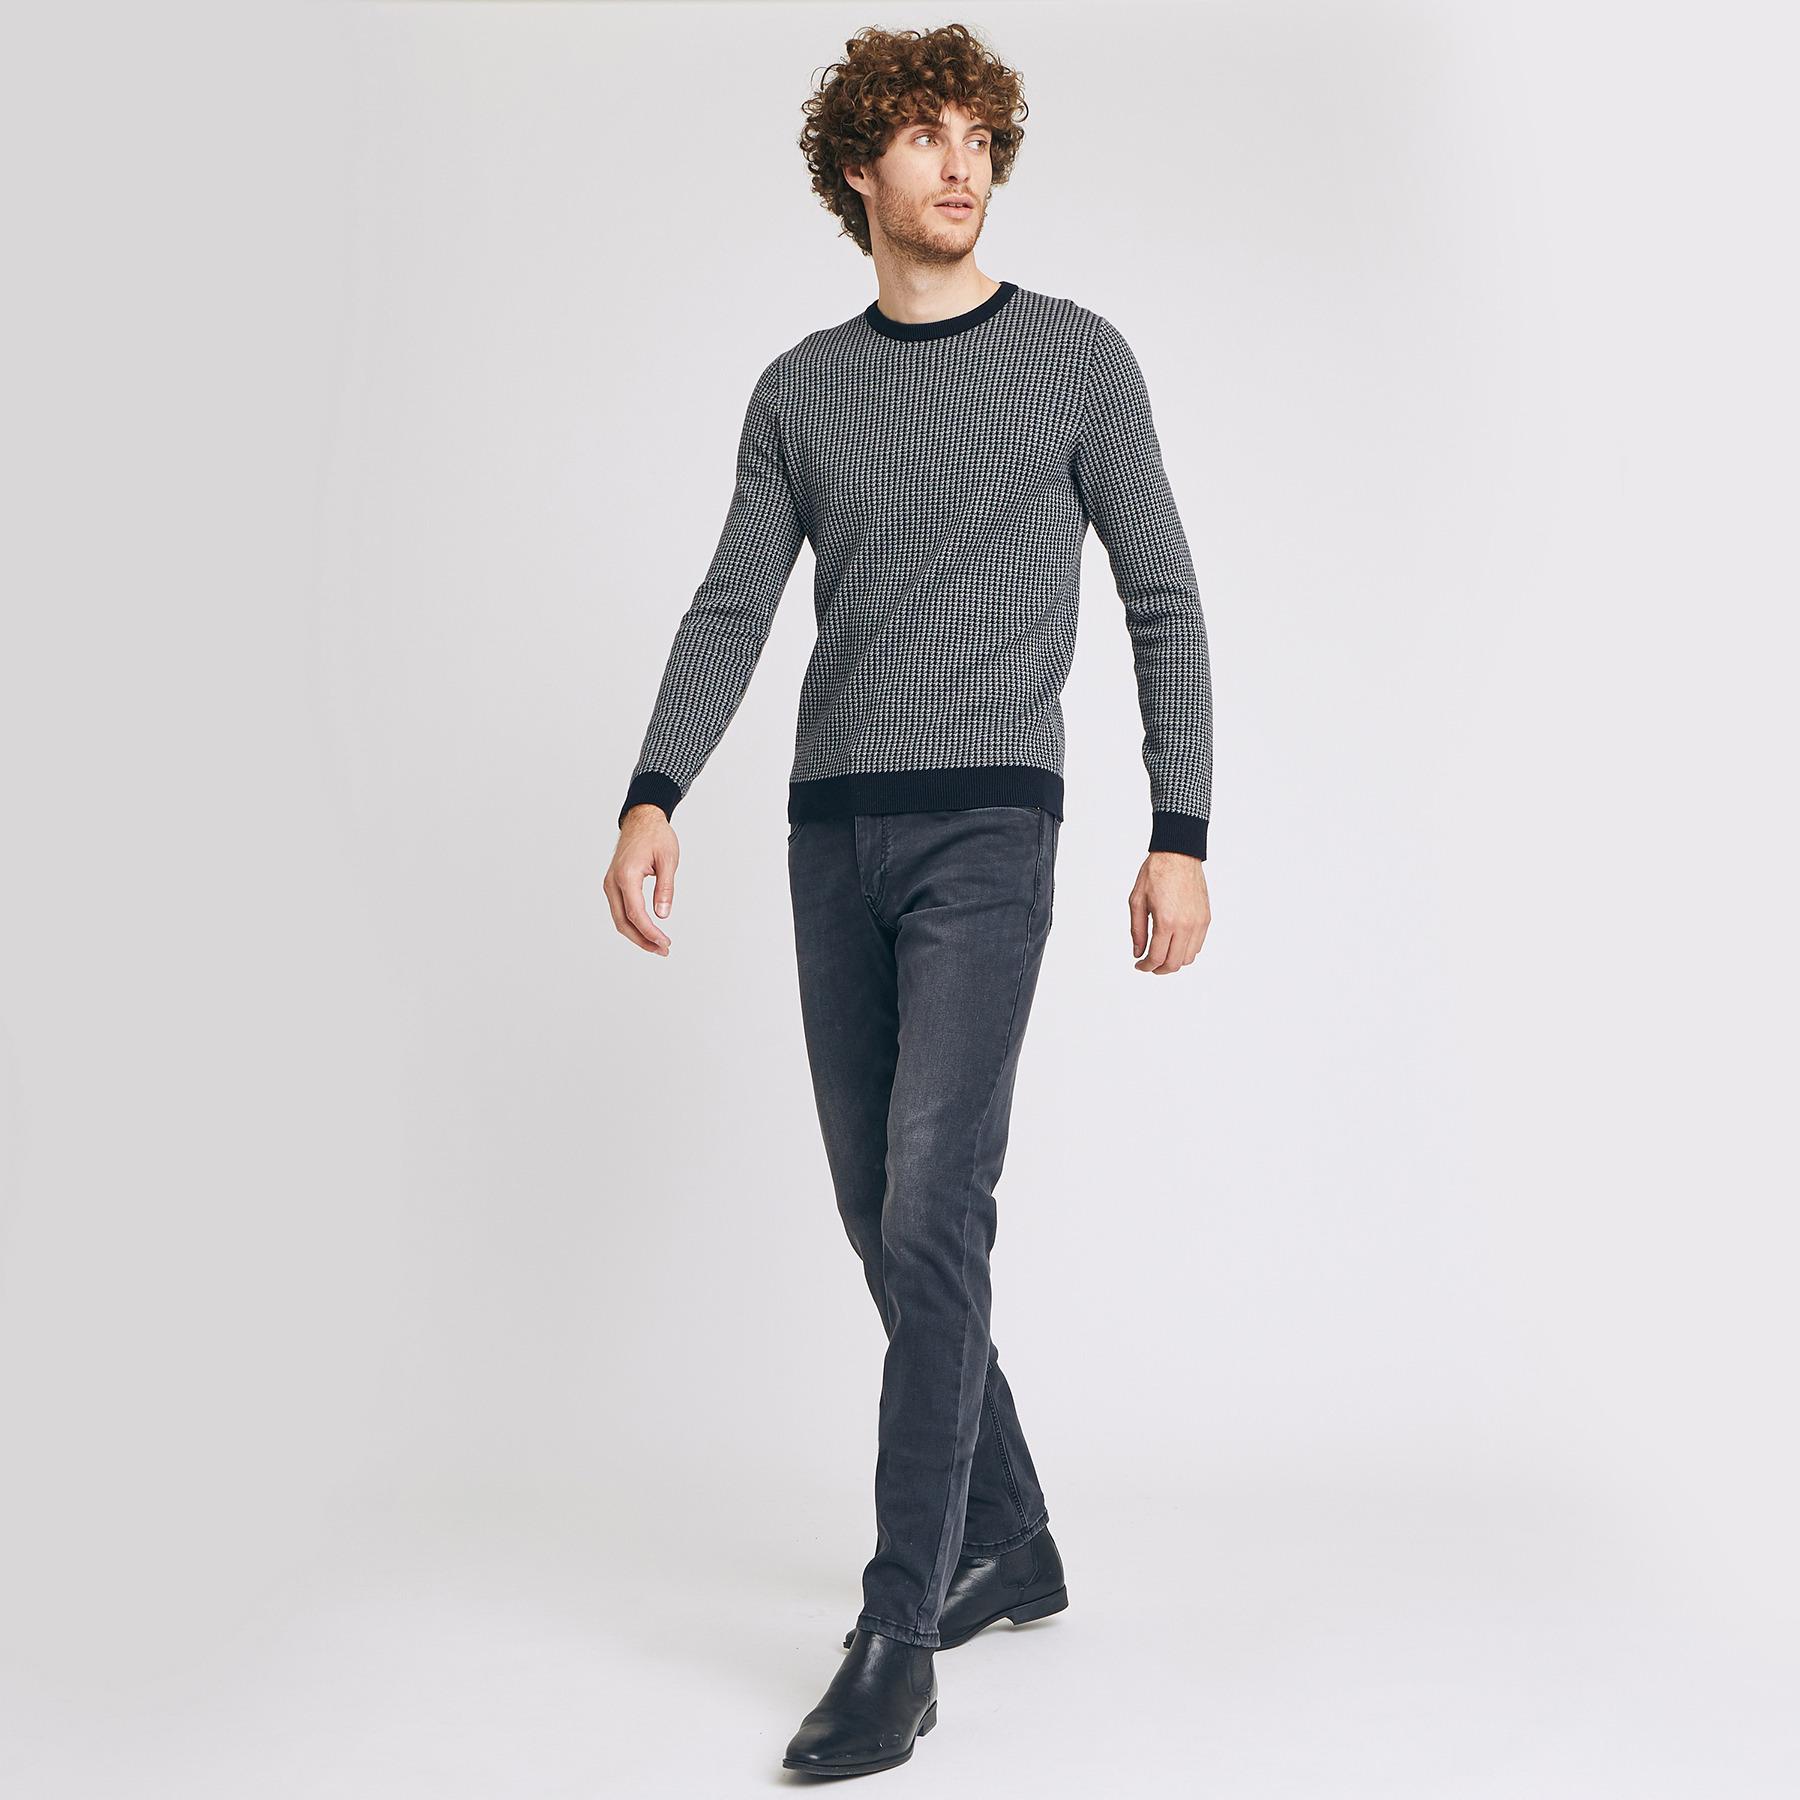 Jean slim #Tom urbanflex 4 longueurs noir lavé Noir Homme